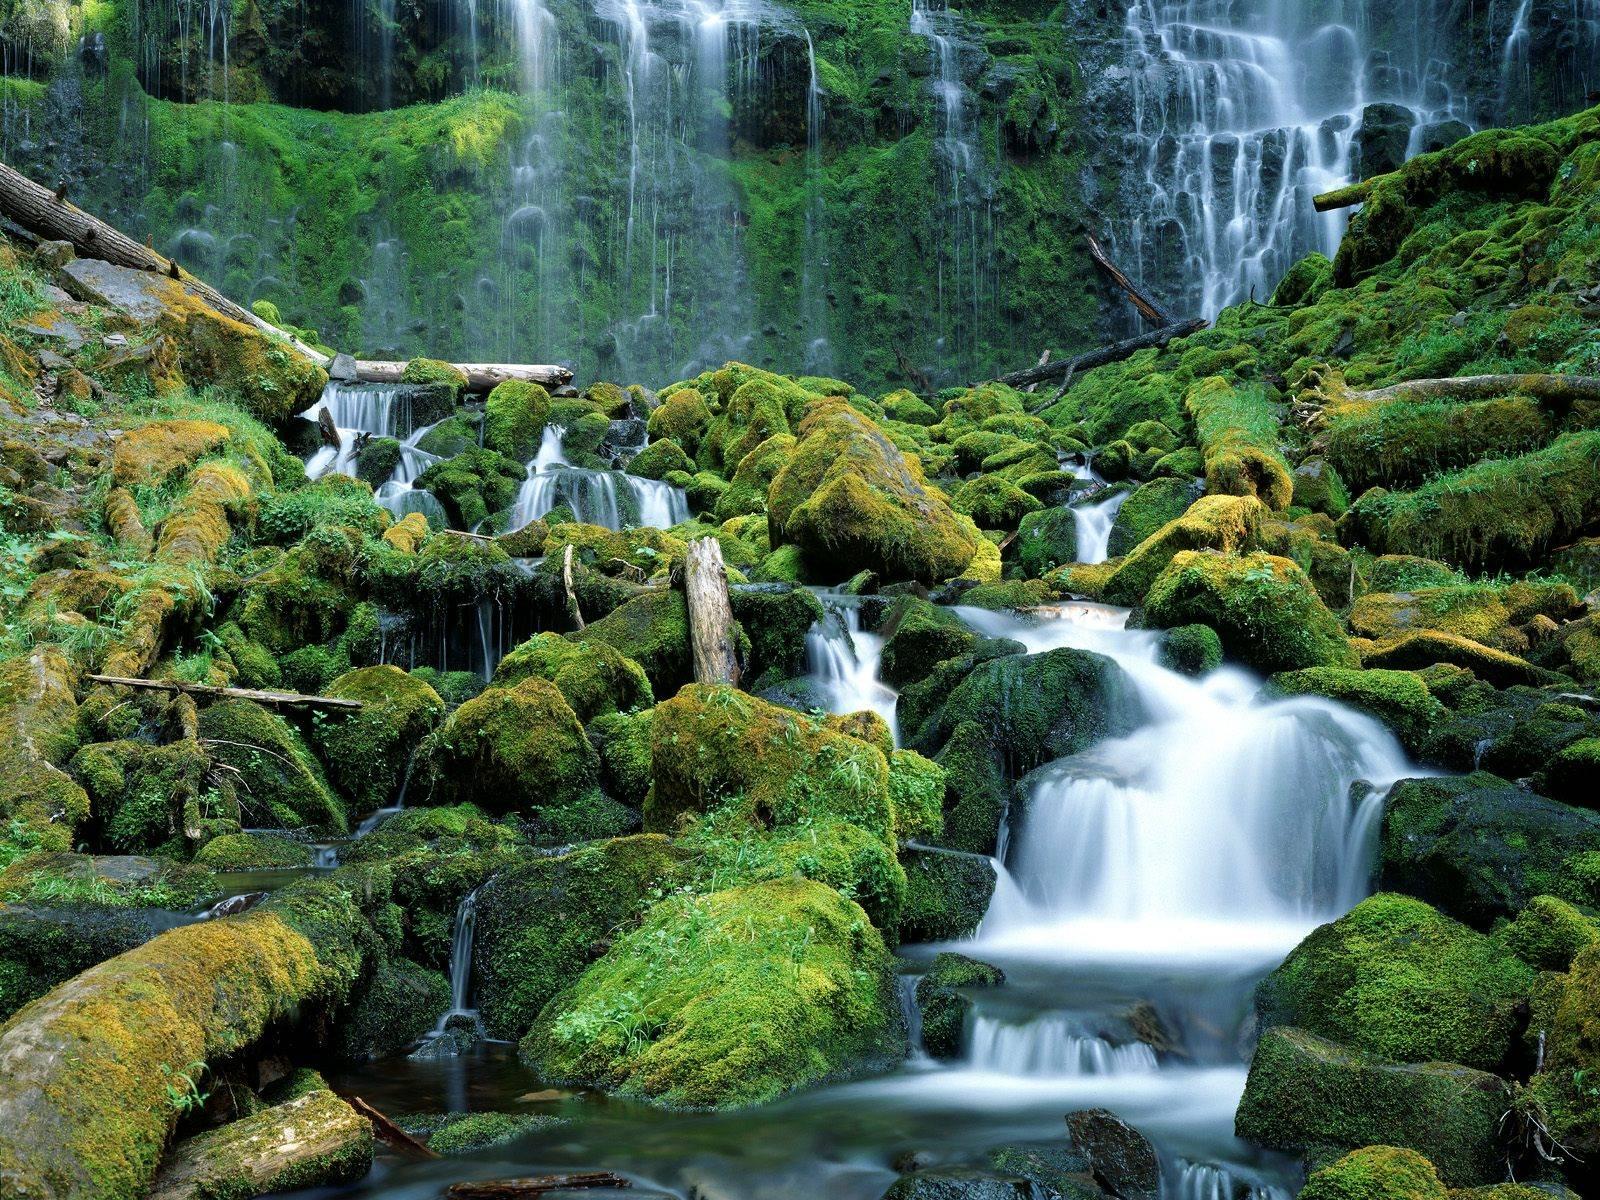 Free 3d Waterfall Live Wallpaper Live Wallpaper Real Waterfall 1080p